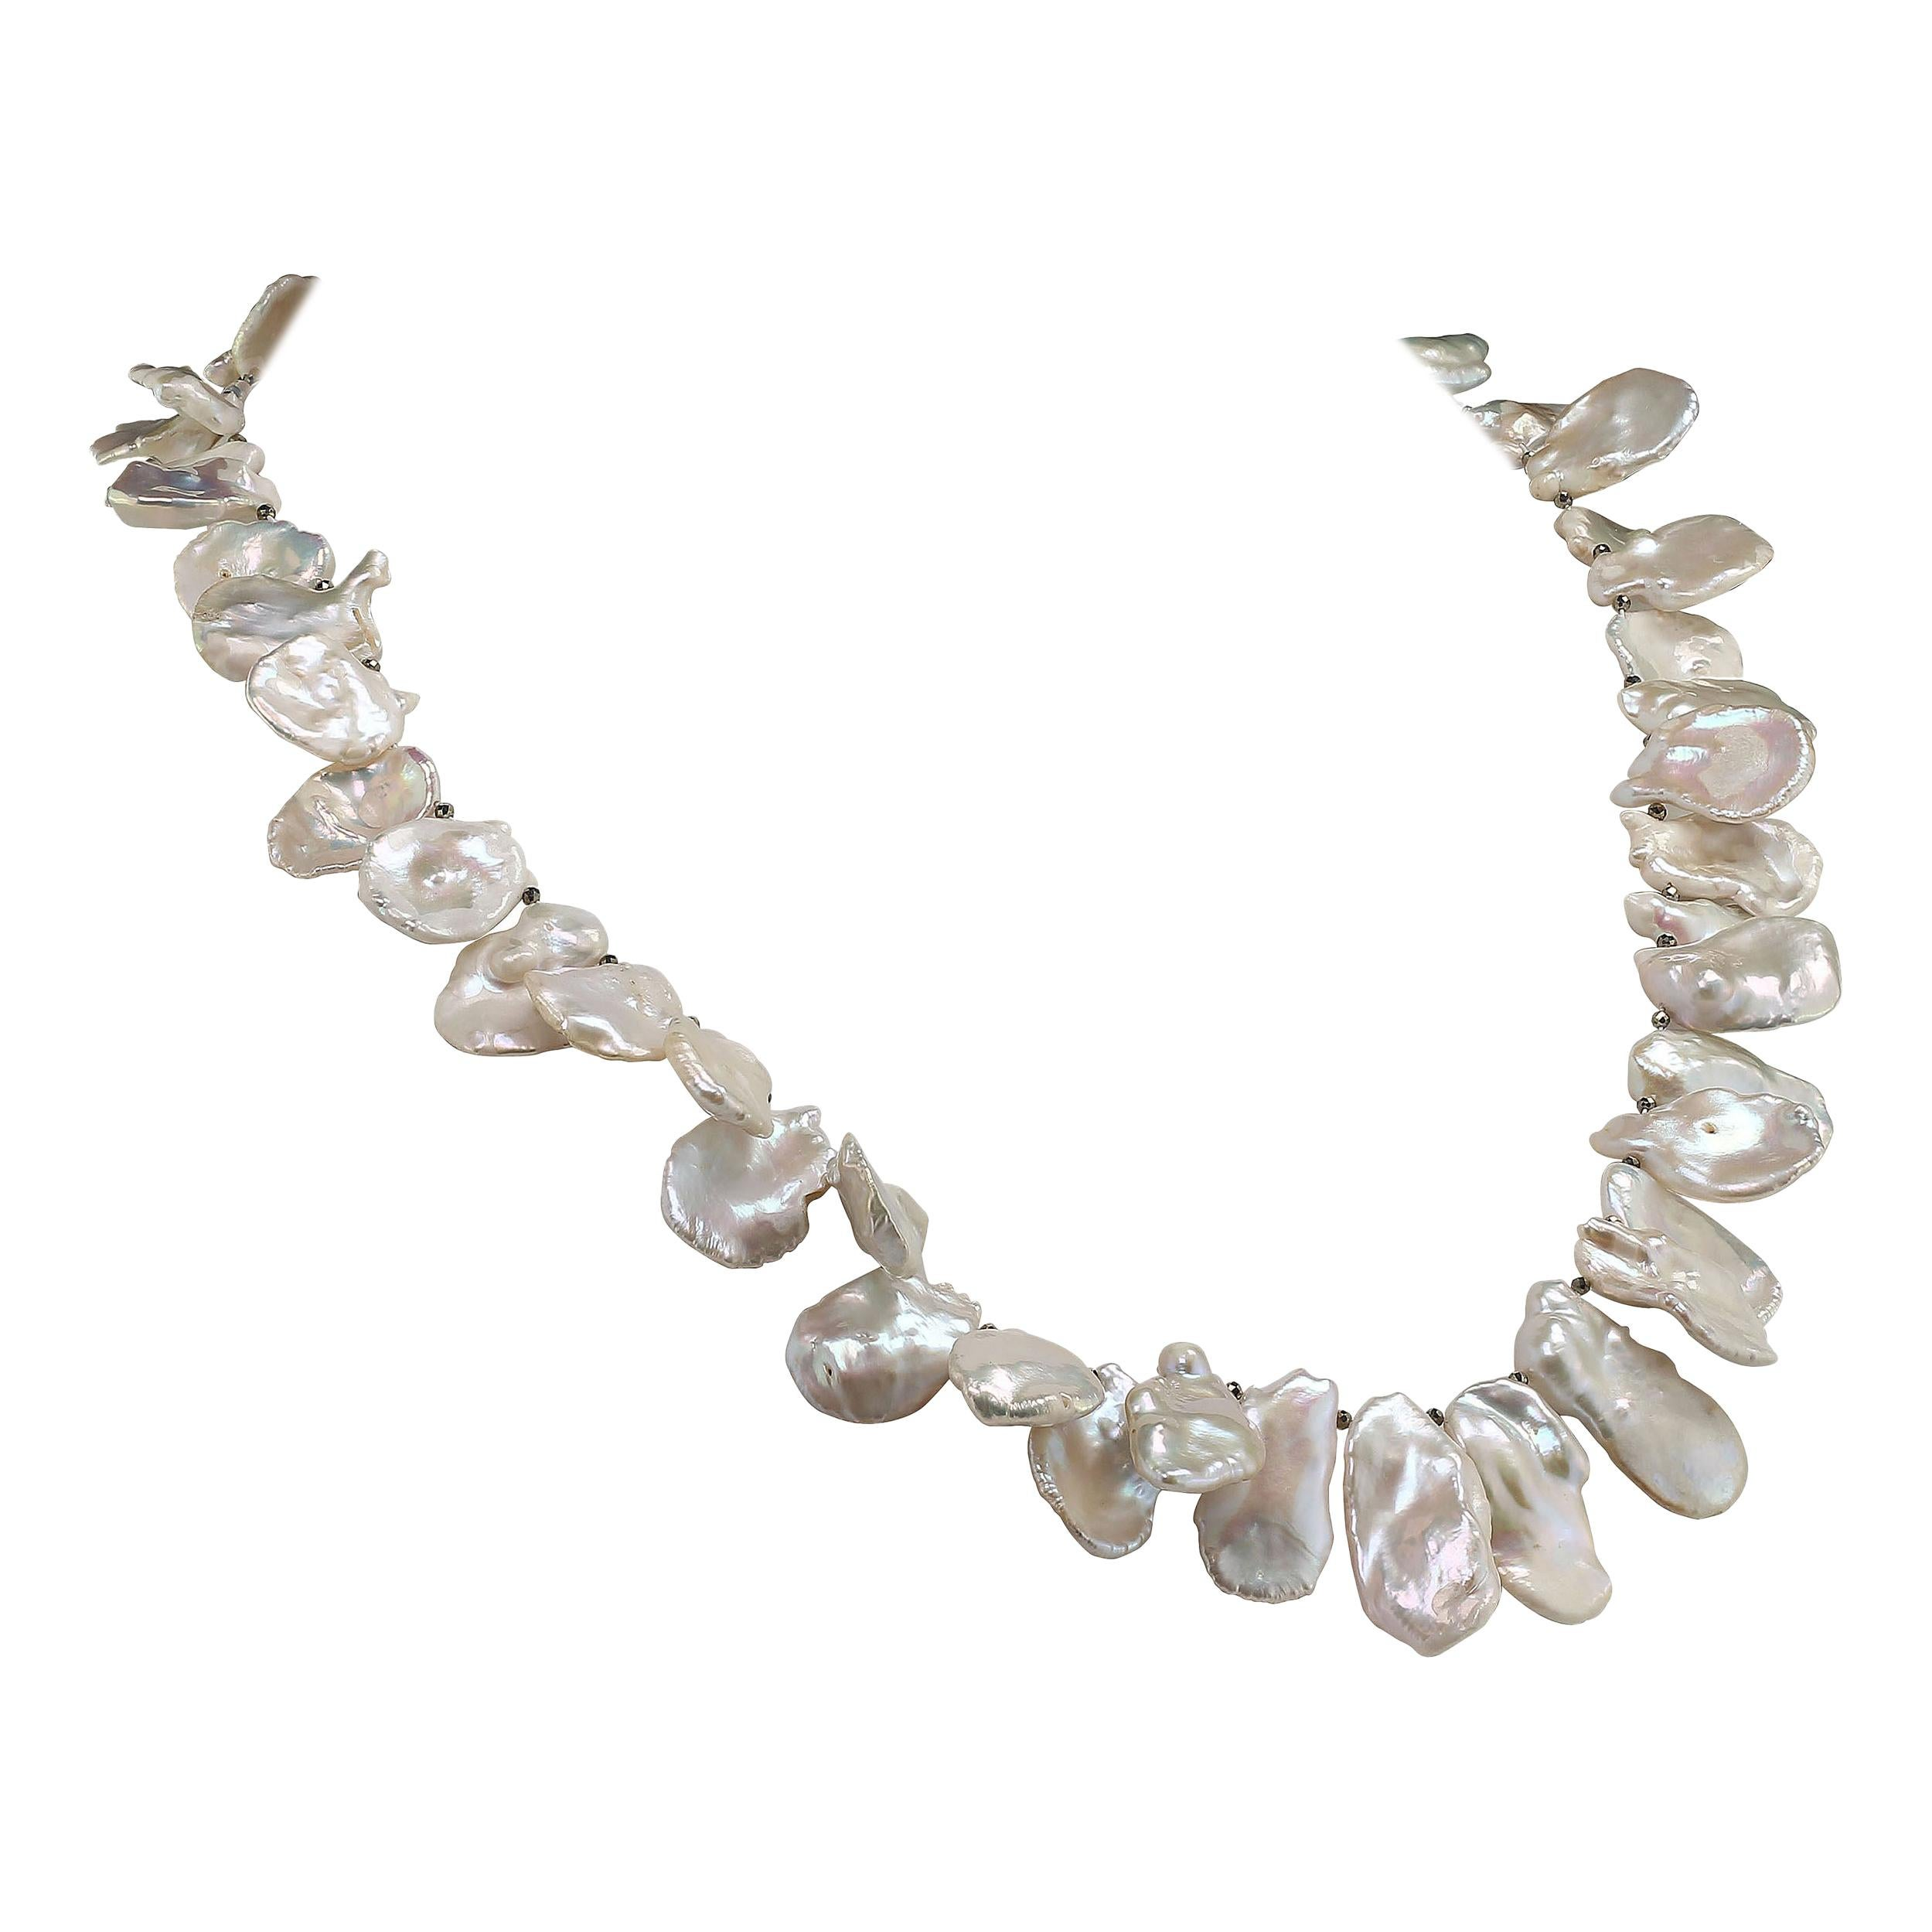 Gemjunky Matinee Length, White, Iridescent Keshi Pearl Necklace June Birthstone